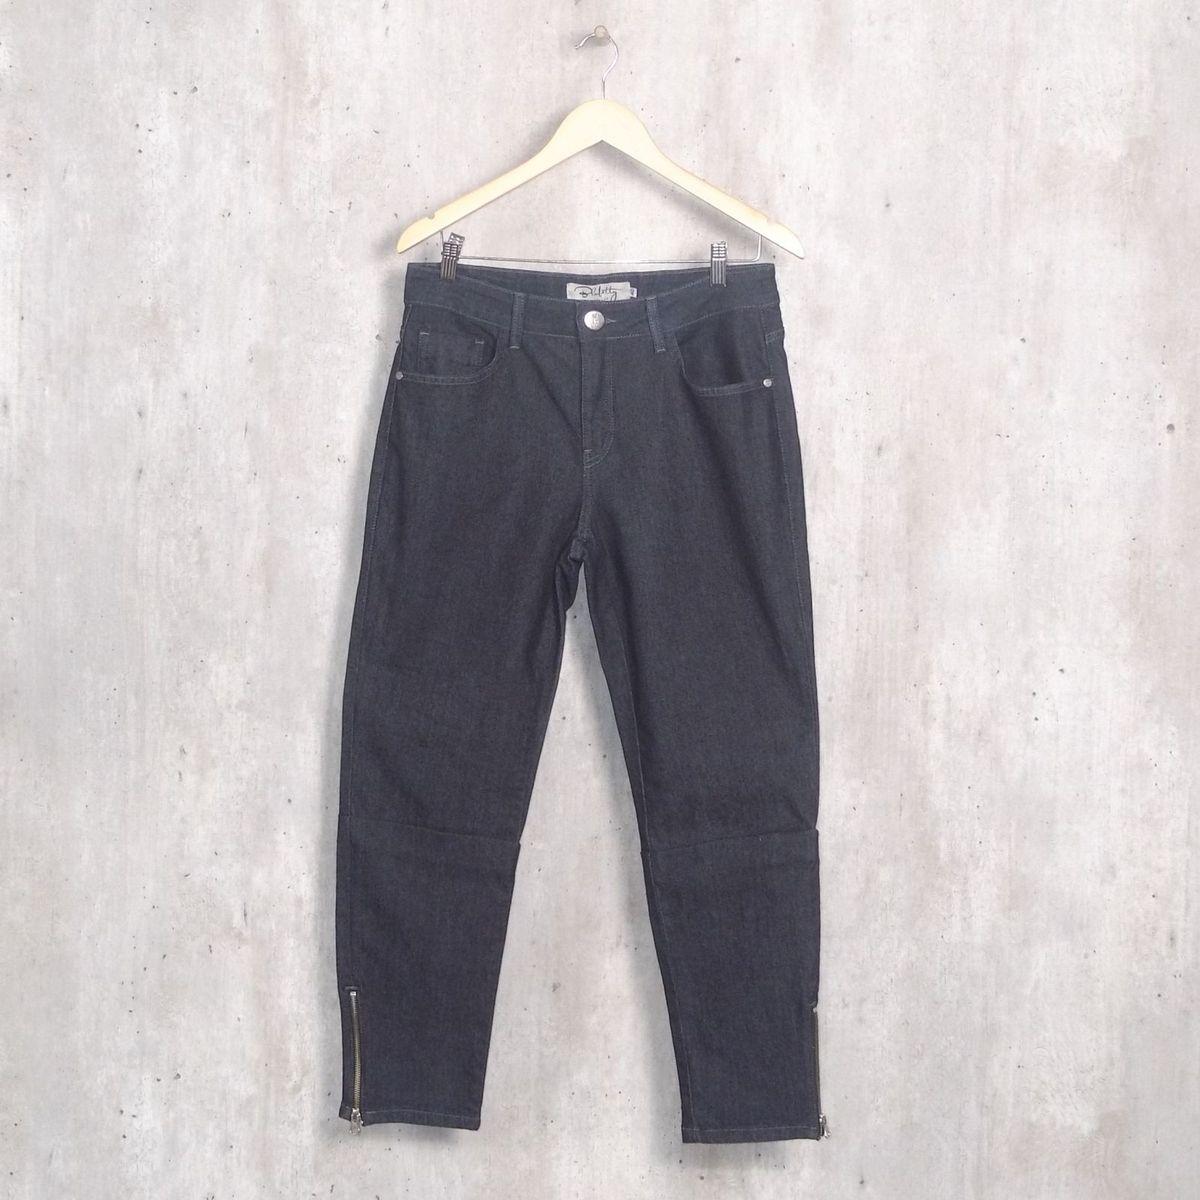 calça jeans dicollani - calças blubetty.  Czm6ly9wag90b3muzw5qb2vplmnvbs5ici9wcm9kdwn0cy83mzk0mtqxlzu3mja4zwyzodk1zjnkndu5y2myotrmodblntmyymu4lmpwzw  ... b5b3d3ada62a3